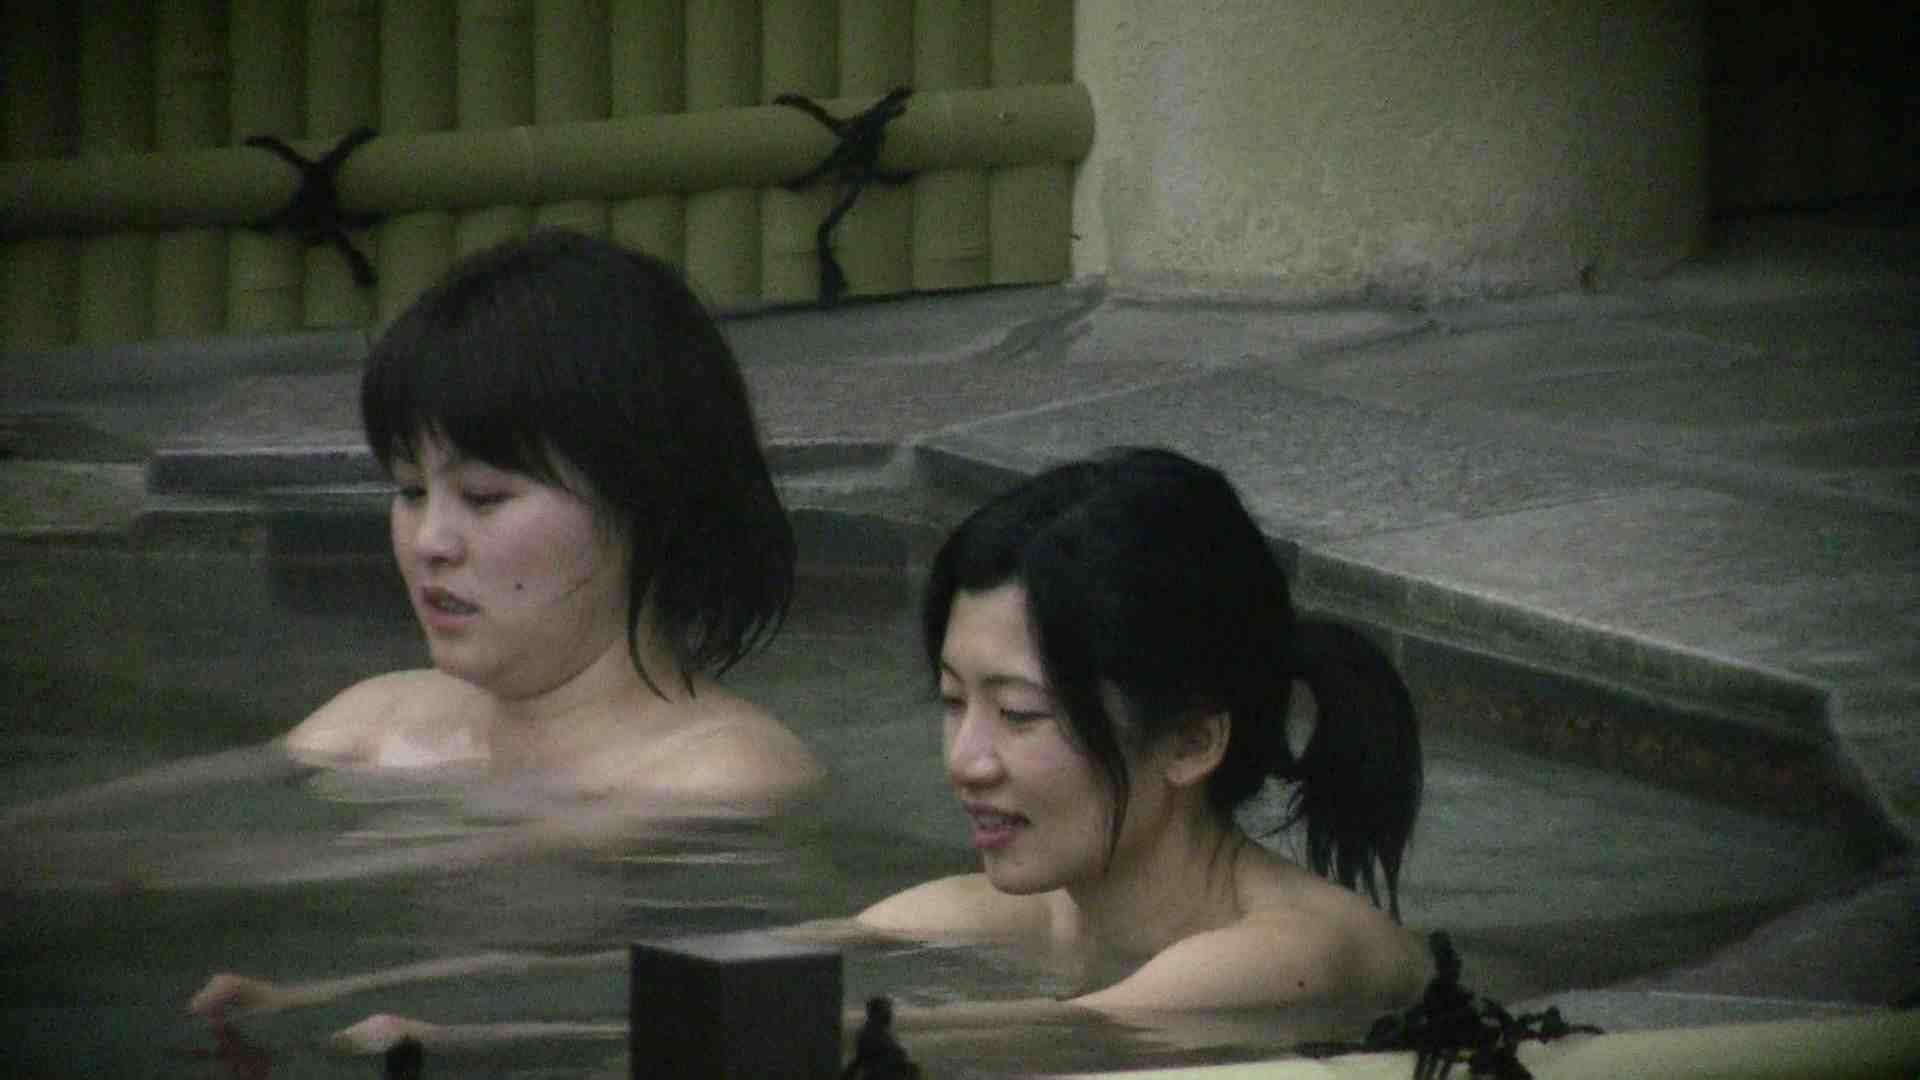 Aquaな露天風呂Vol.539 盗撮  62pic 28